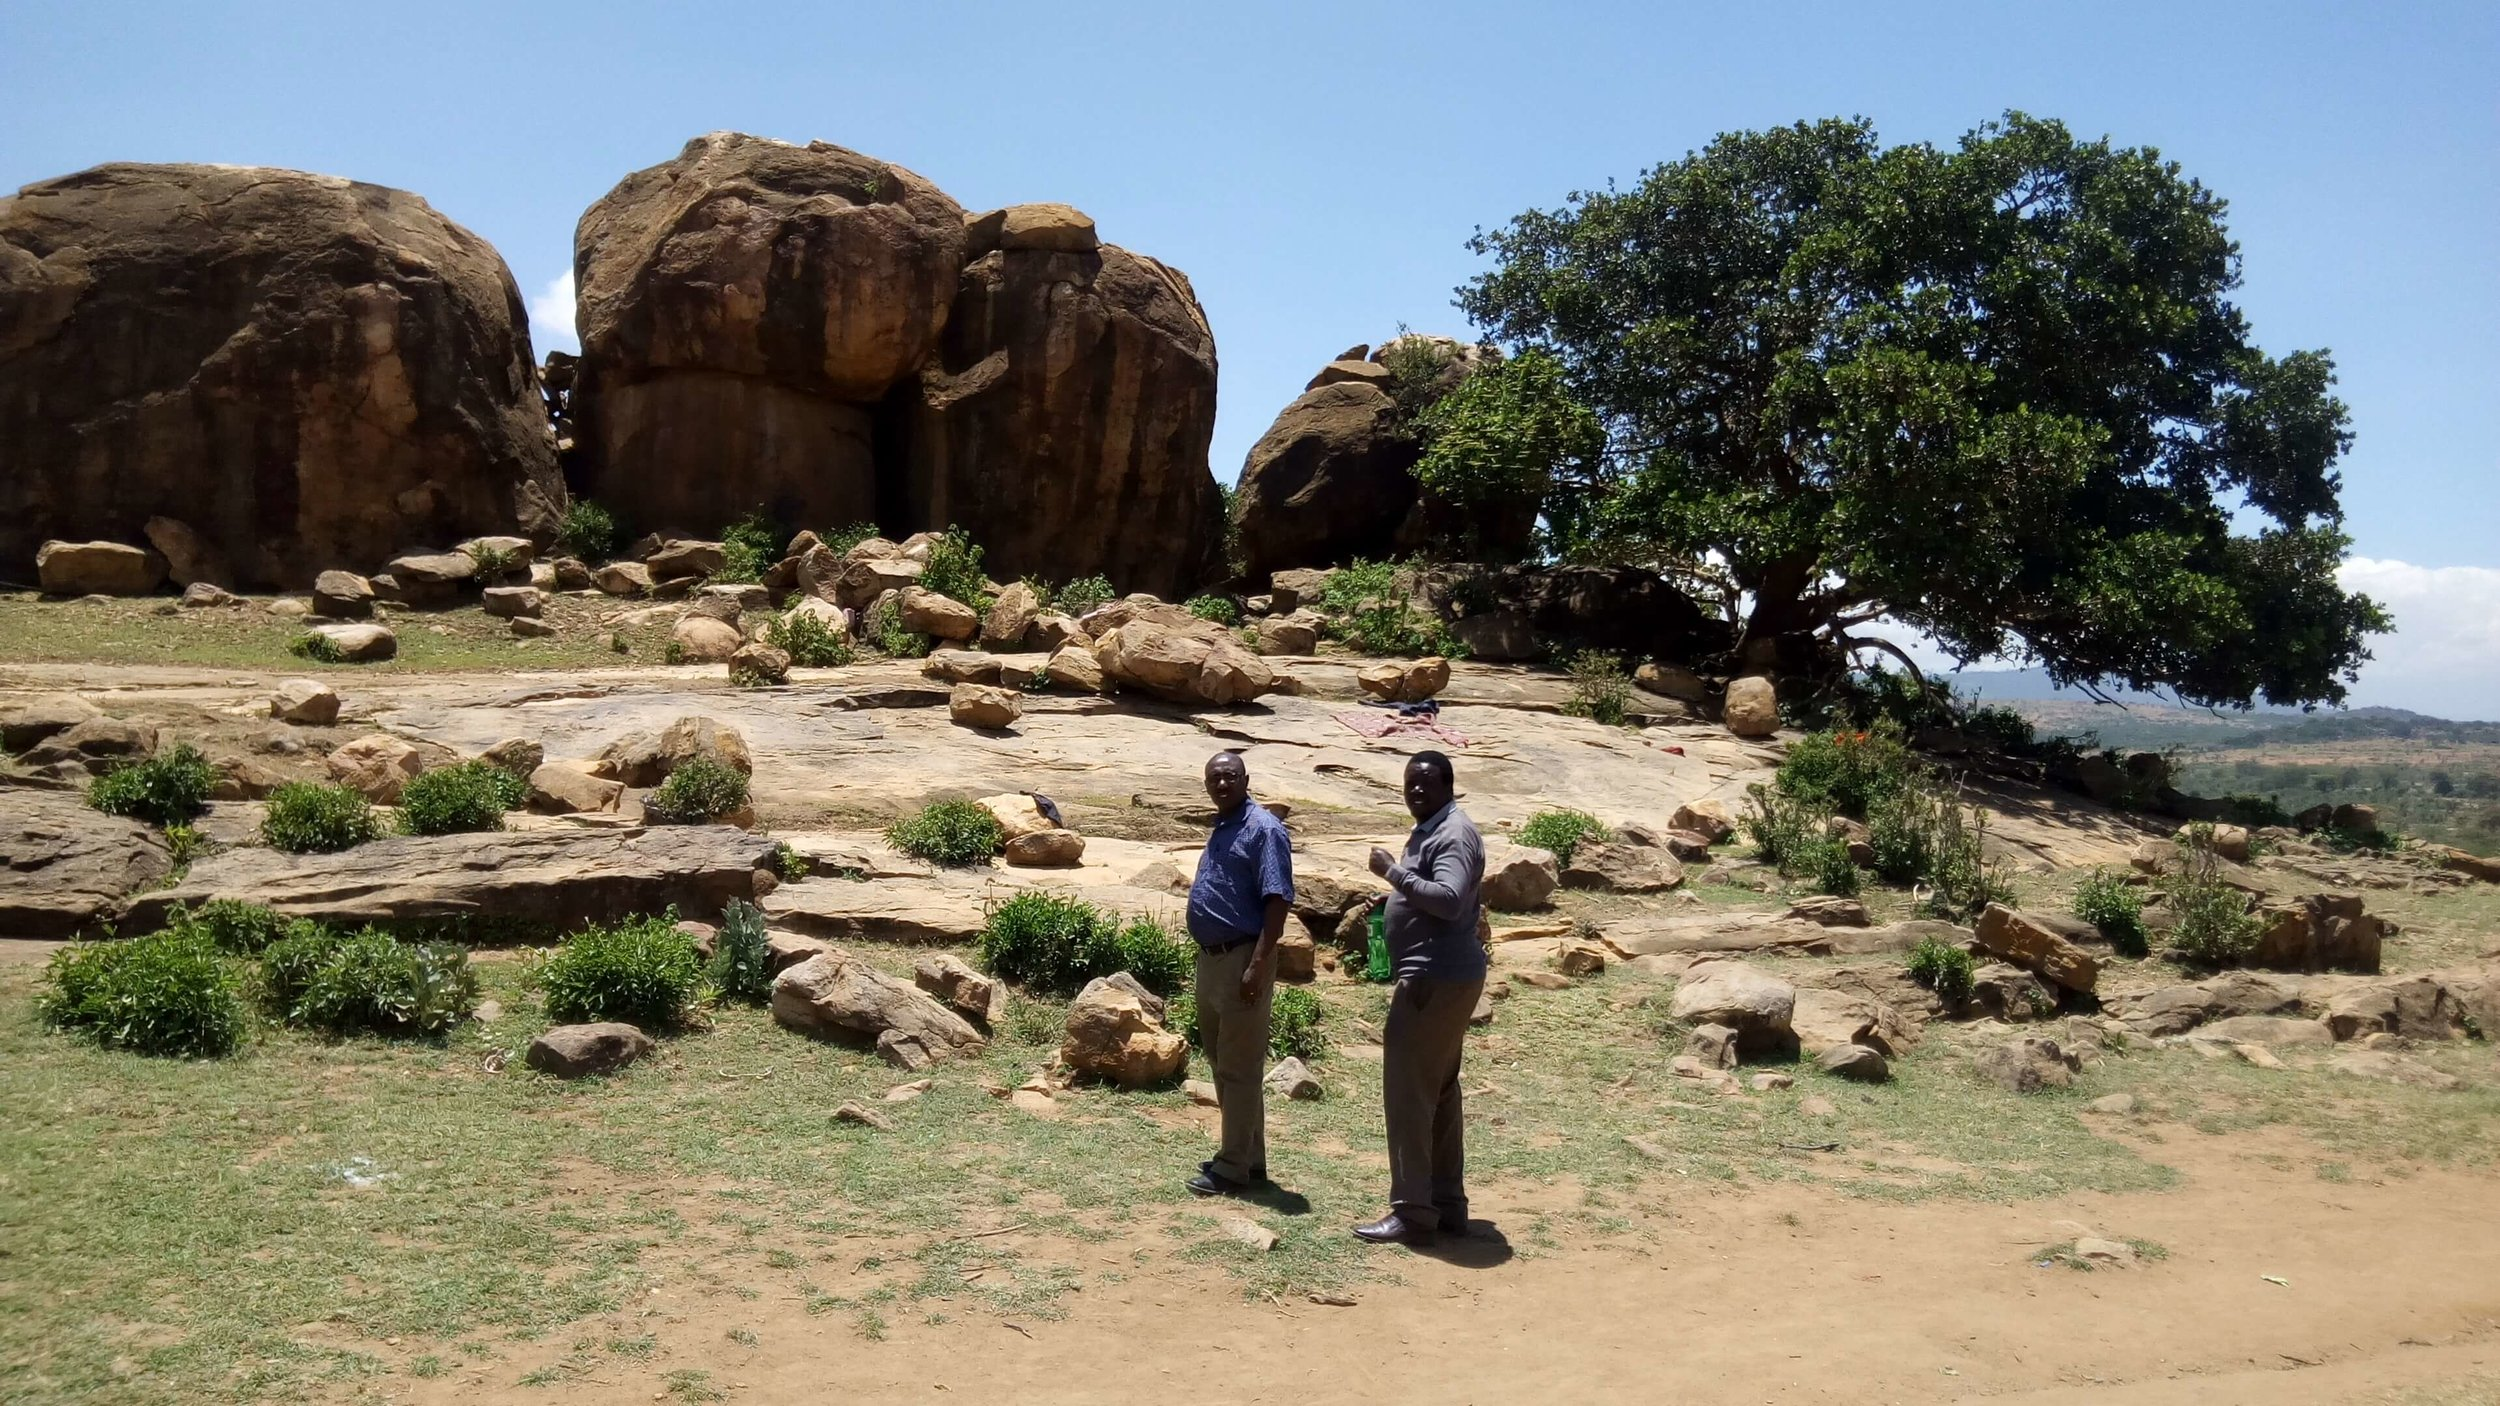 Jaslika Consulting co-associate Samuel Mukundi and research consultant Dennis Odhiambo enjoying the scenery while conducting field work.